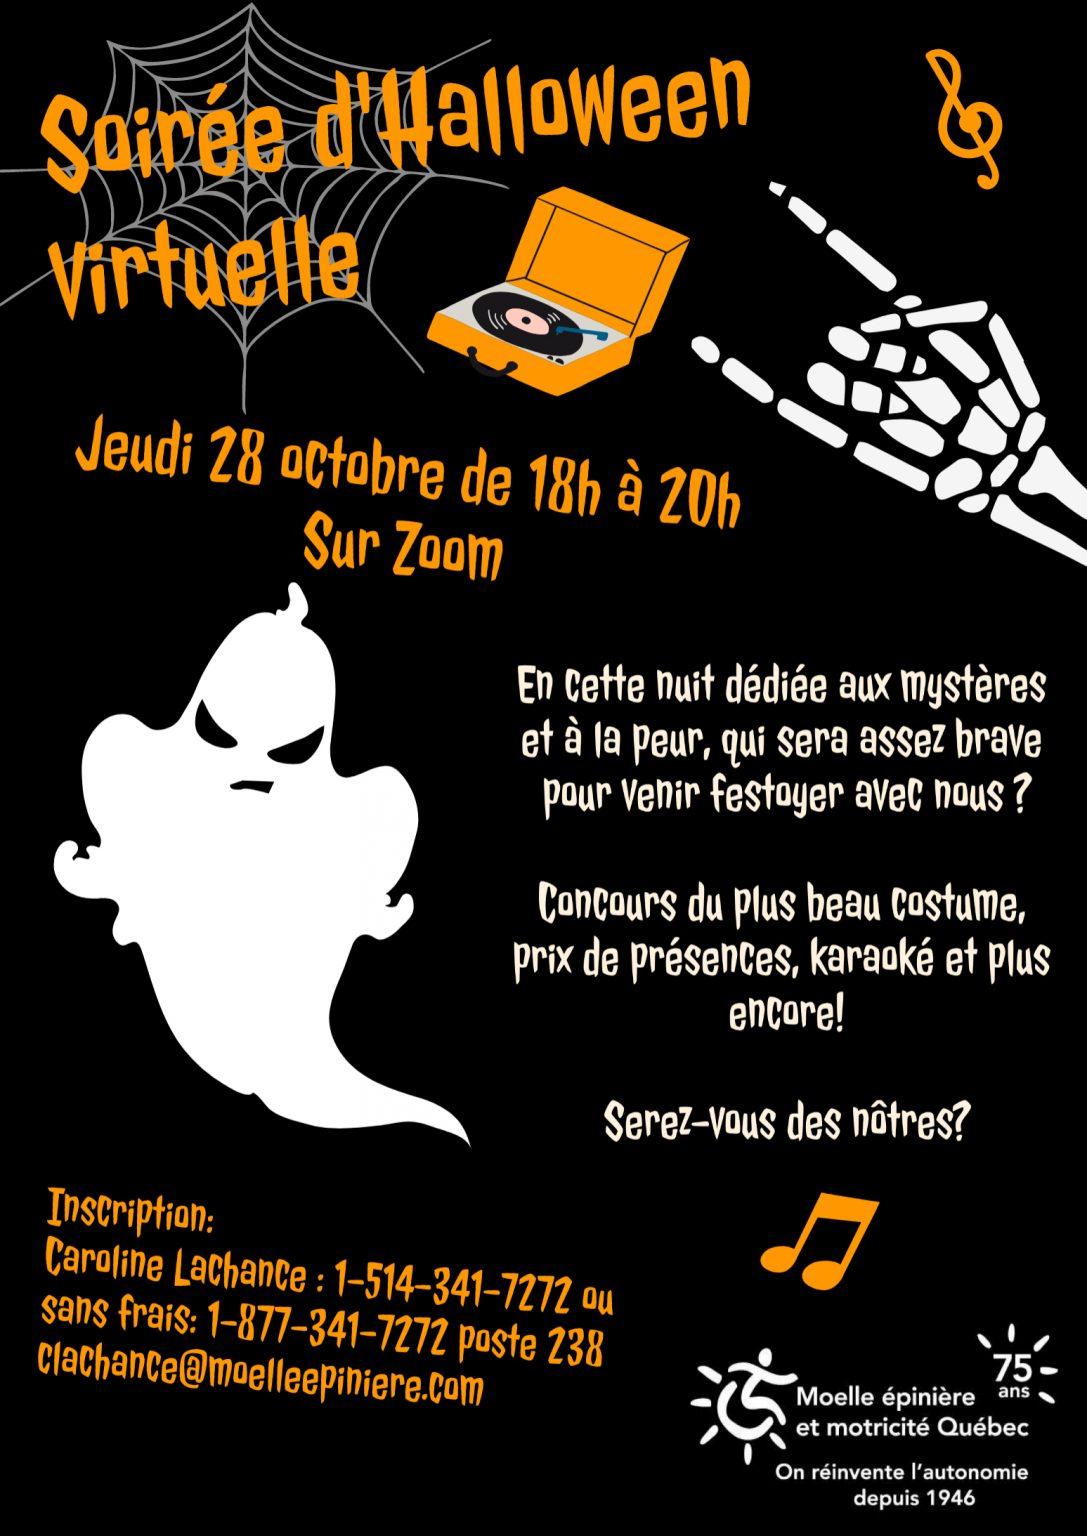 Finder is committed to editorial independence. Soirée d'Halloween virtuelle - Moelle Epinière et Motricité Québec